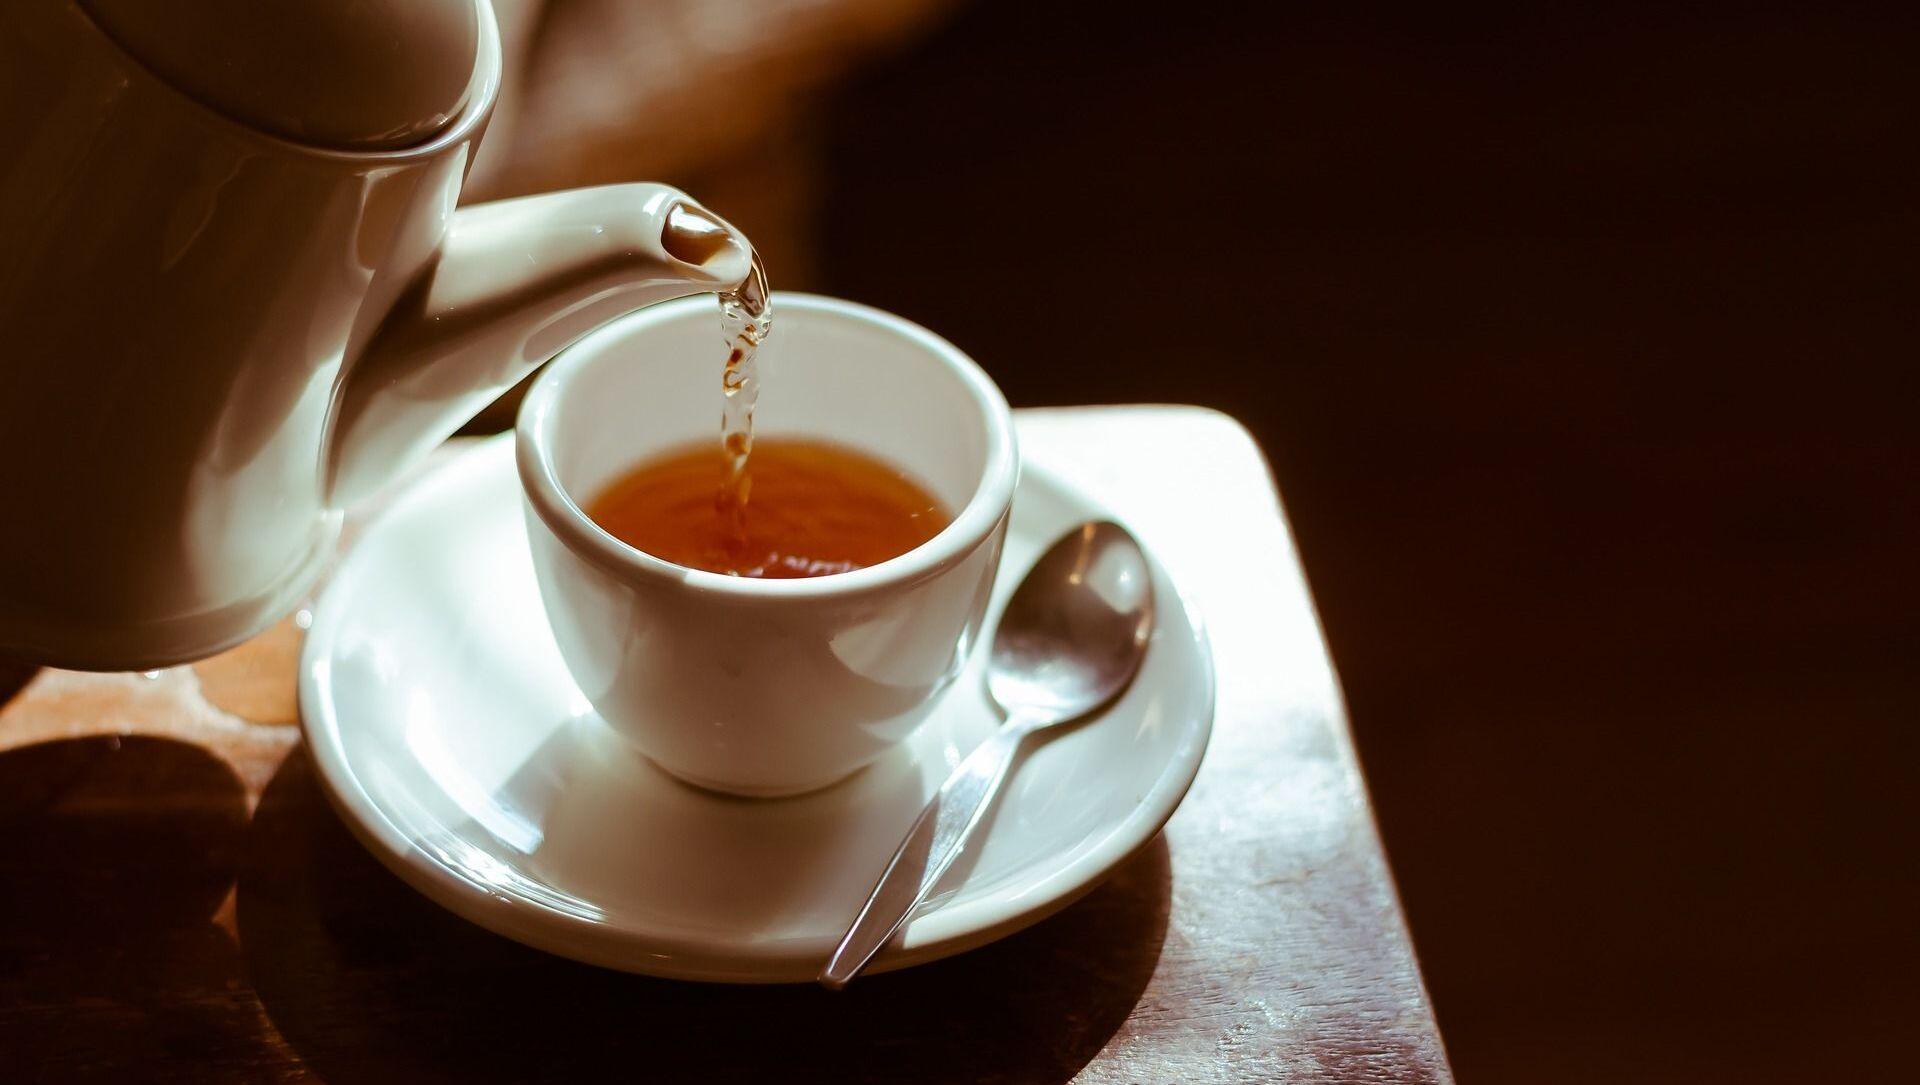 Filiżanka herbaty - Sputnik Polska, 1920, 22.05.2021